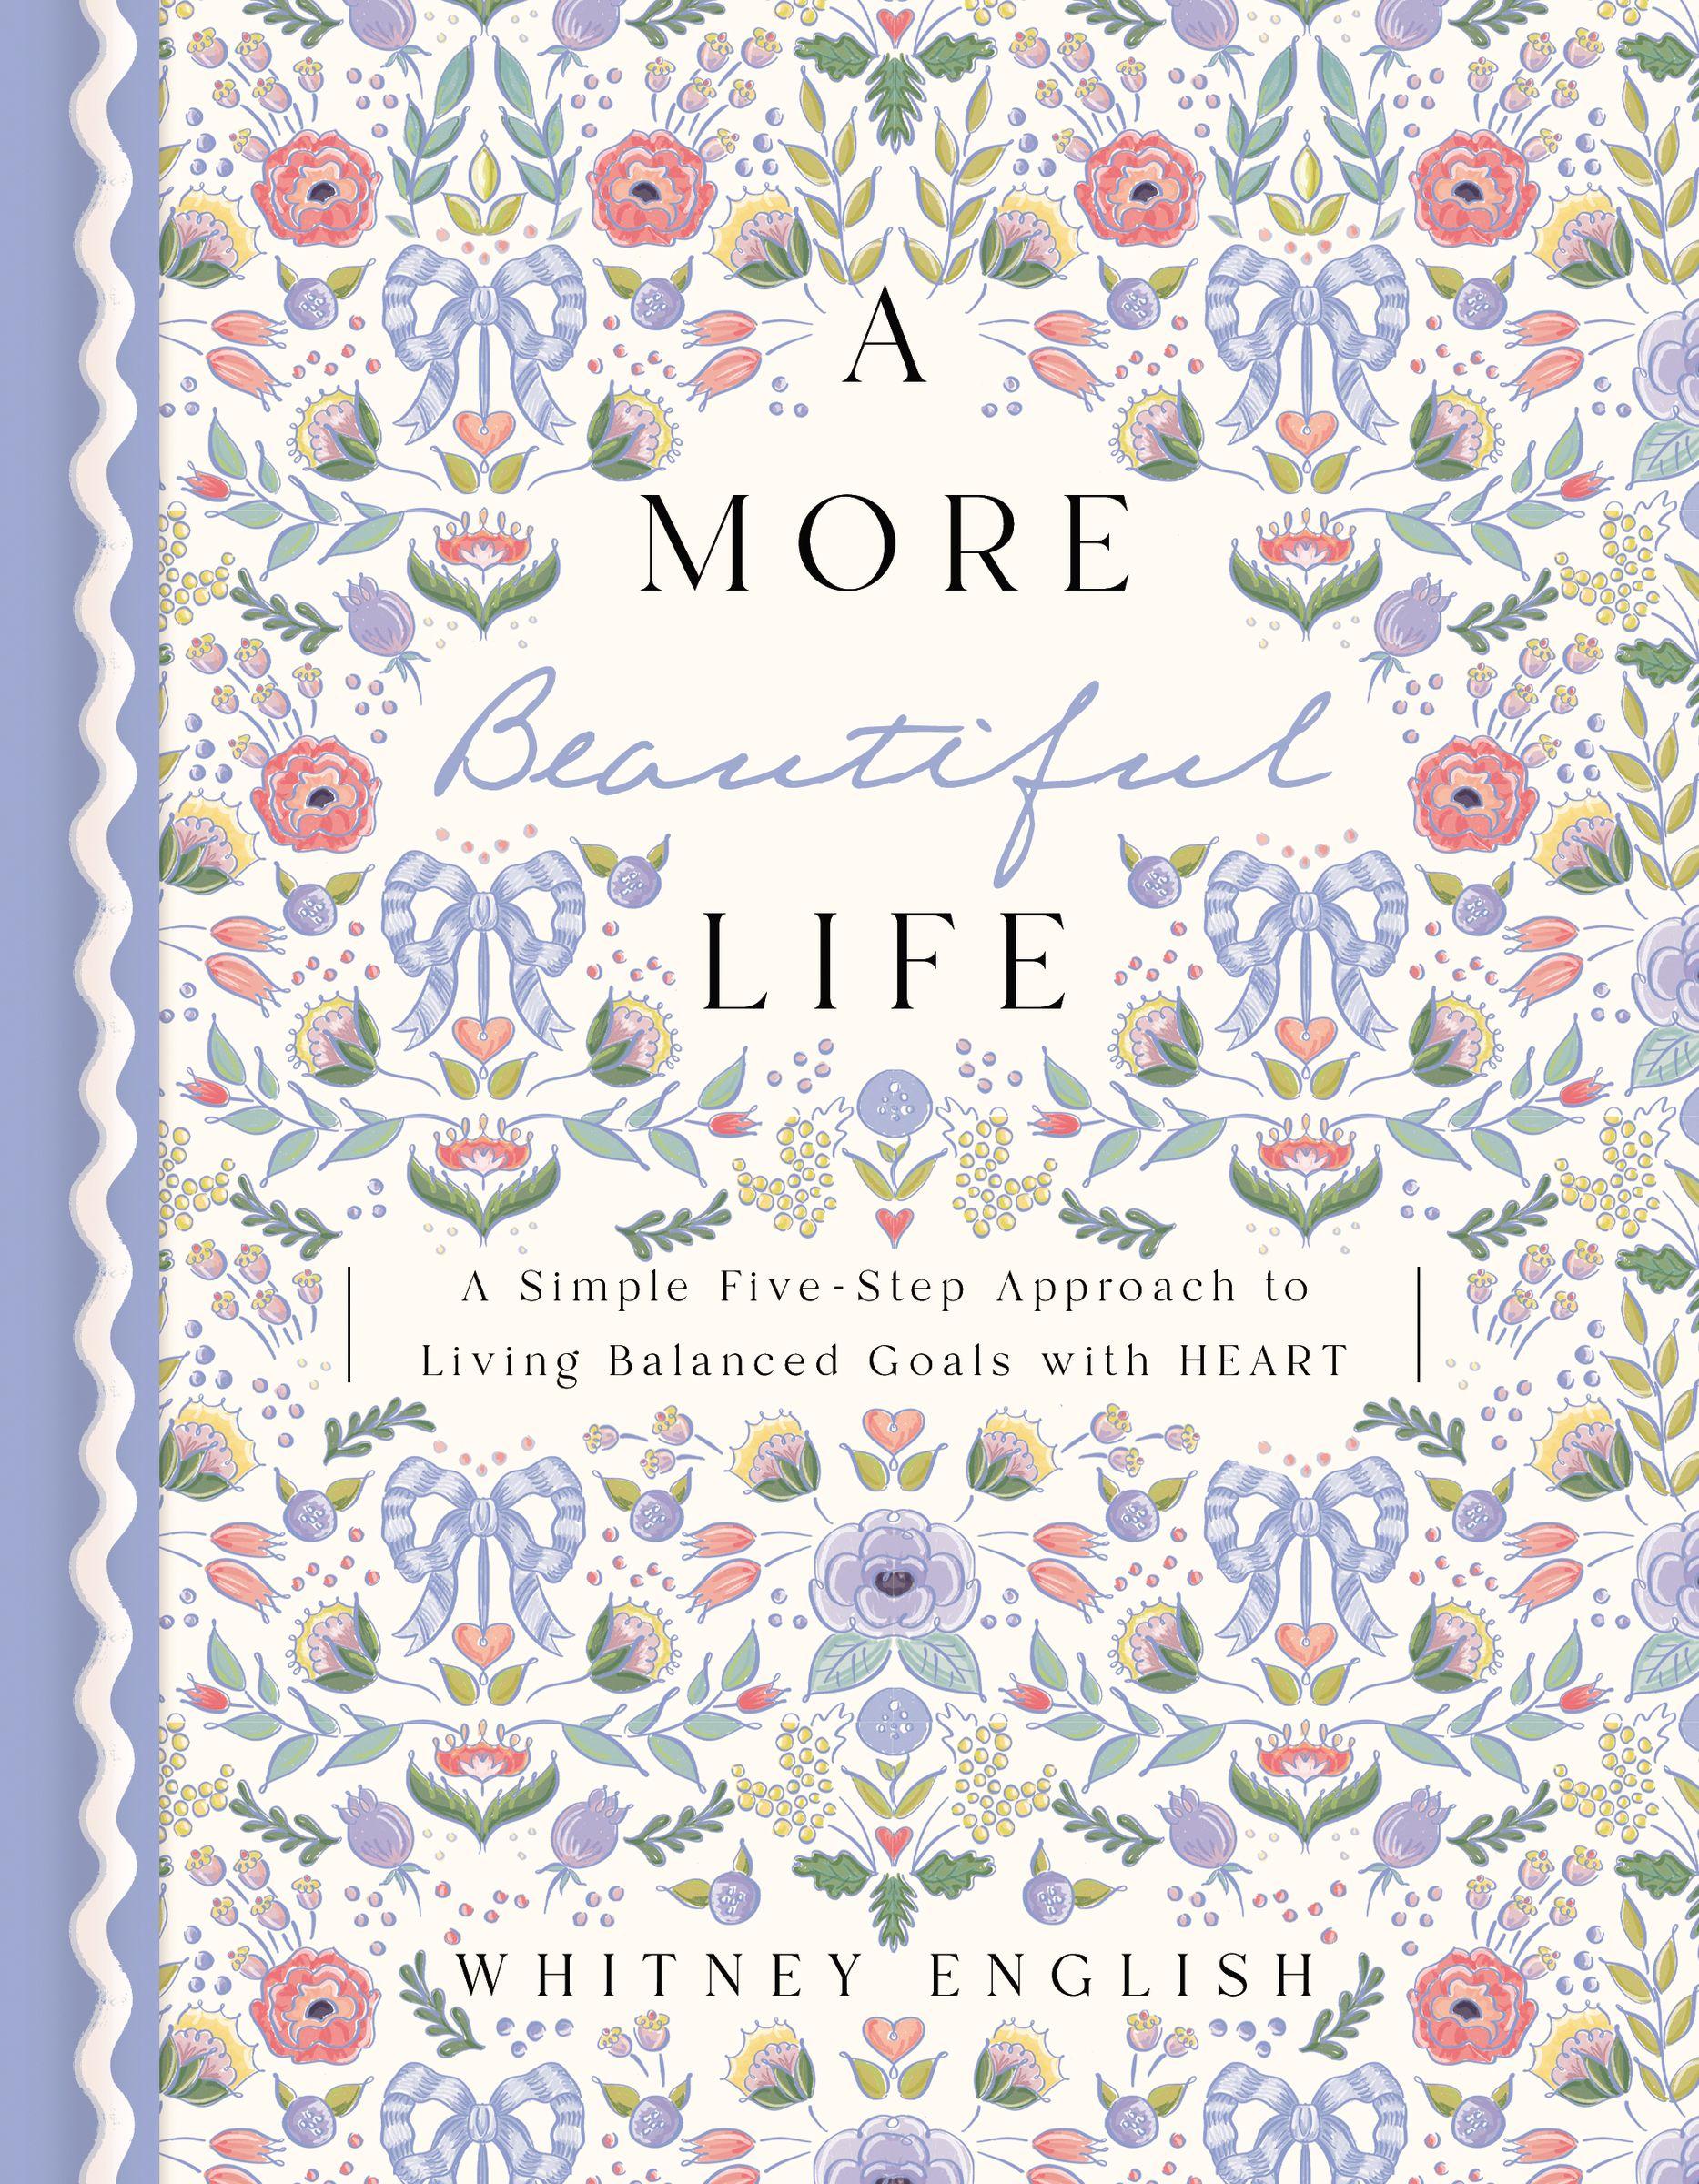 A More Beautiful Life